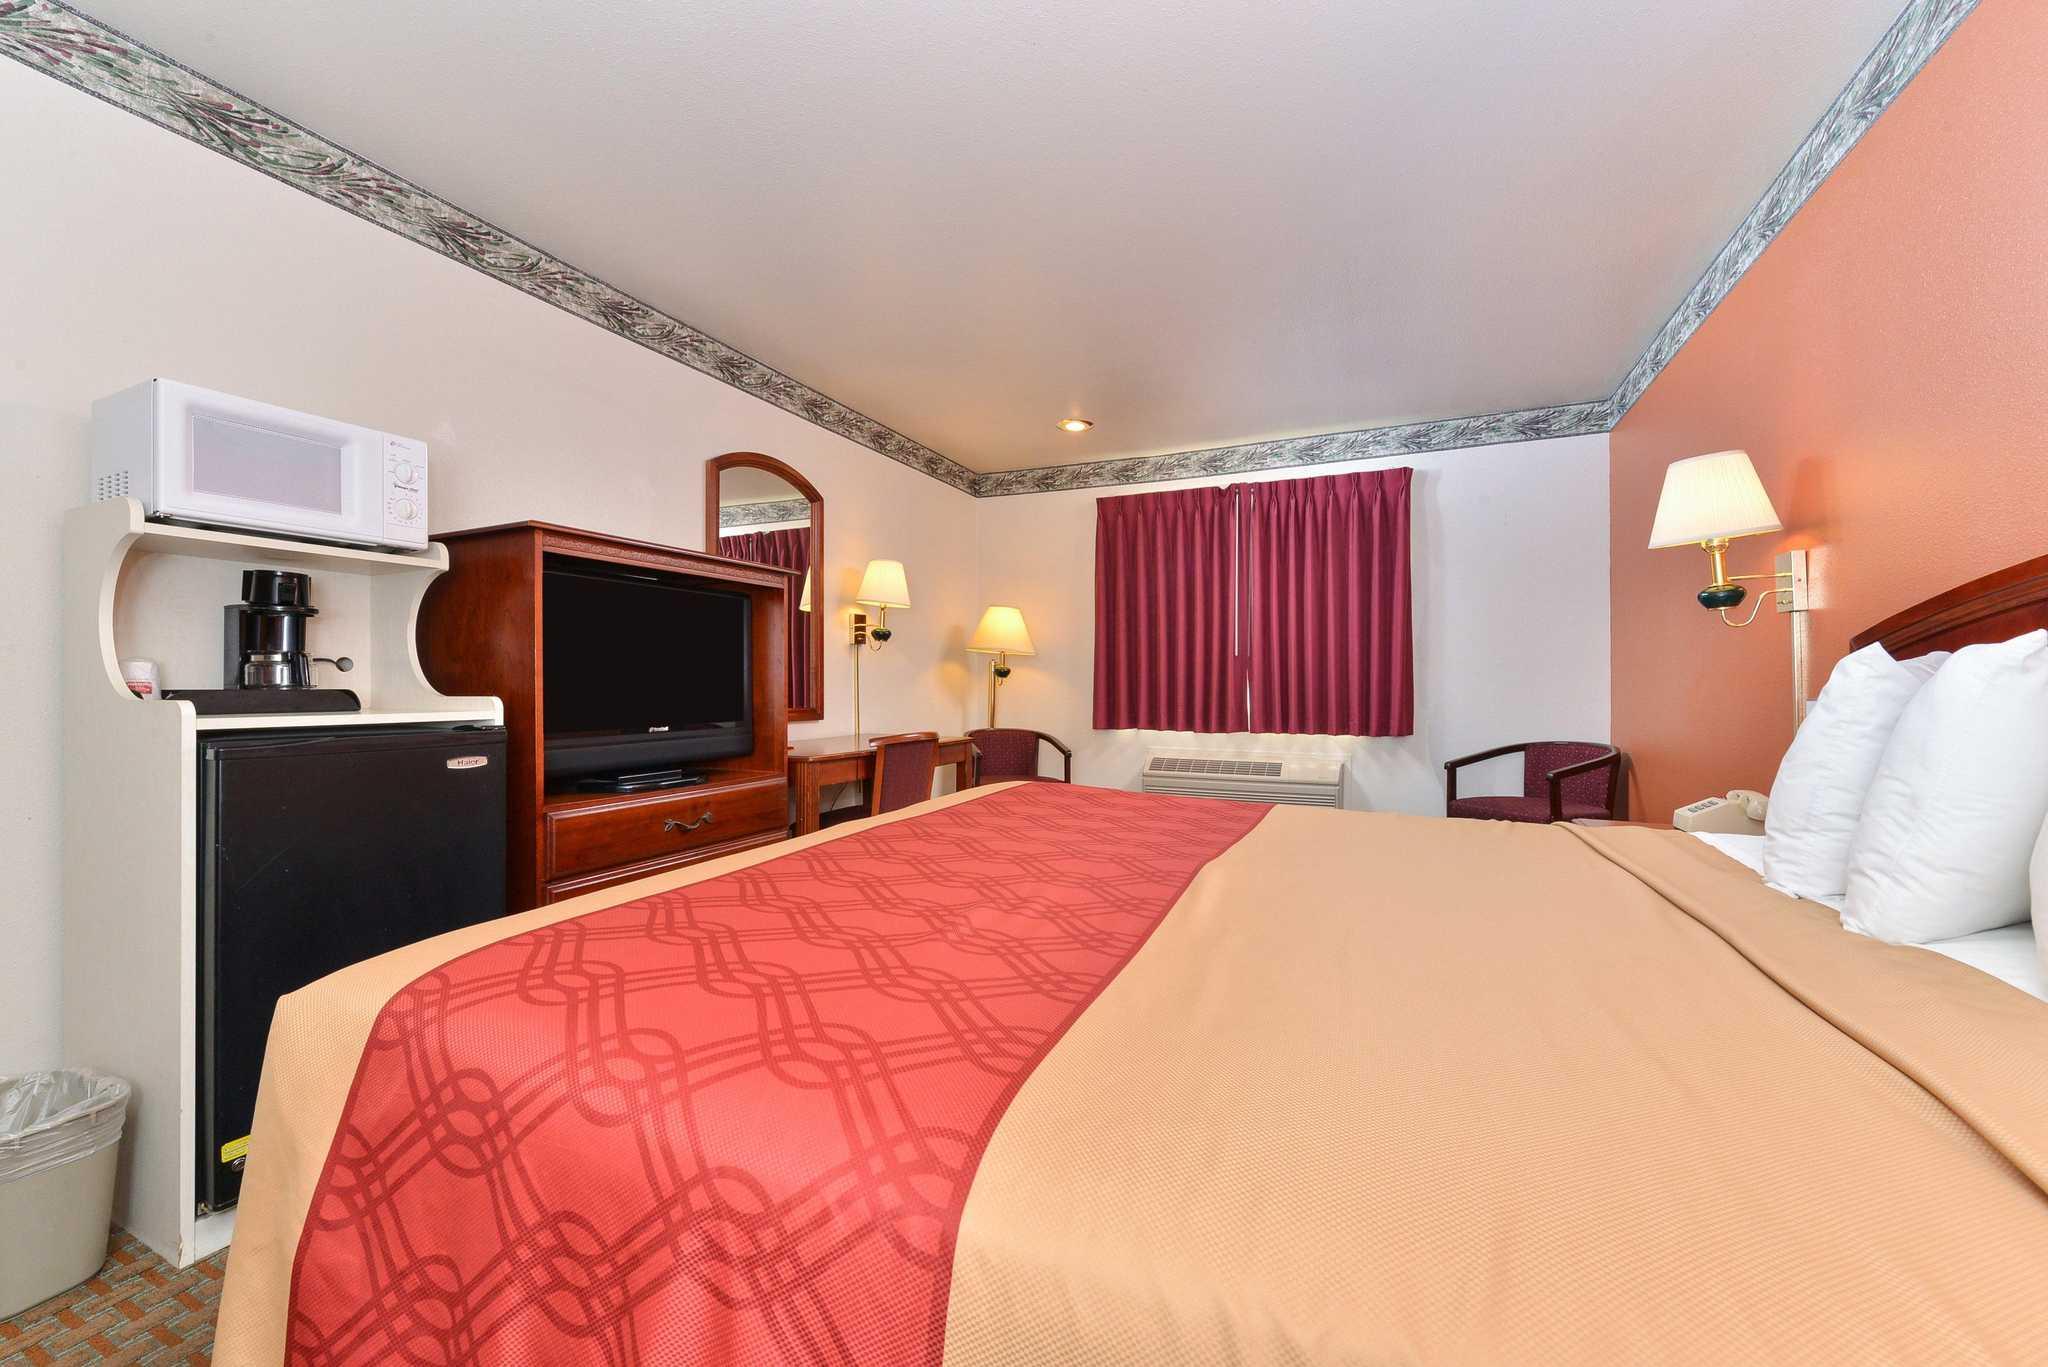 Econo Lodge Inn & Suites image 7